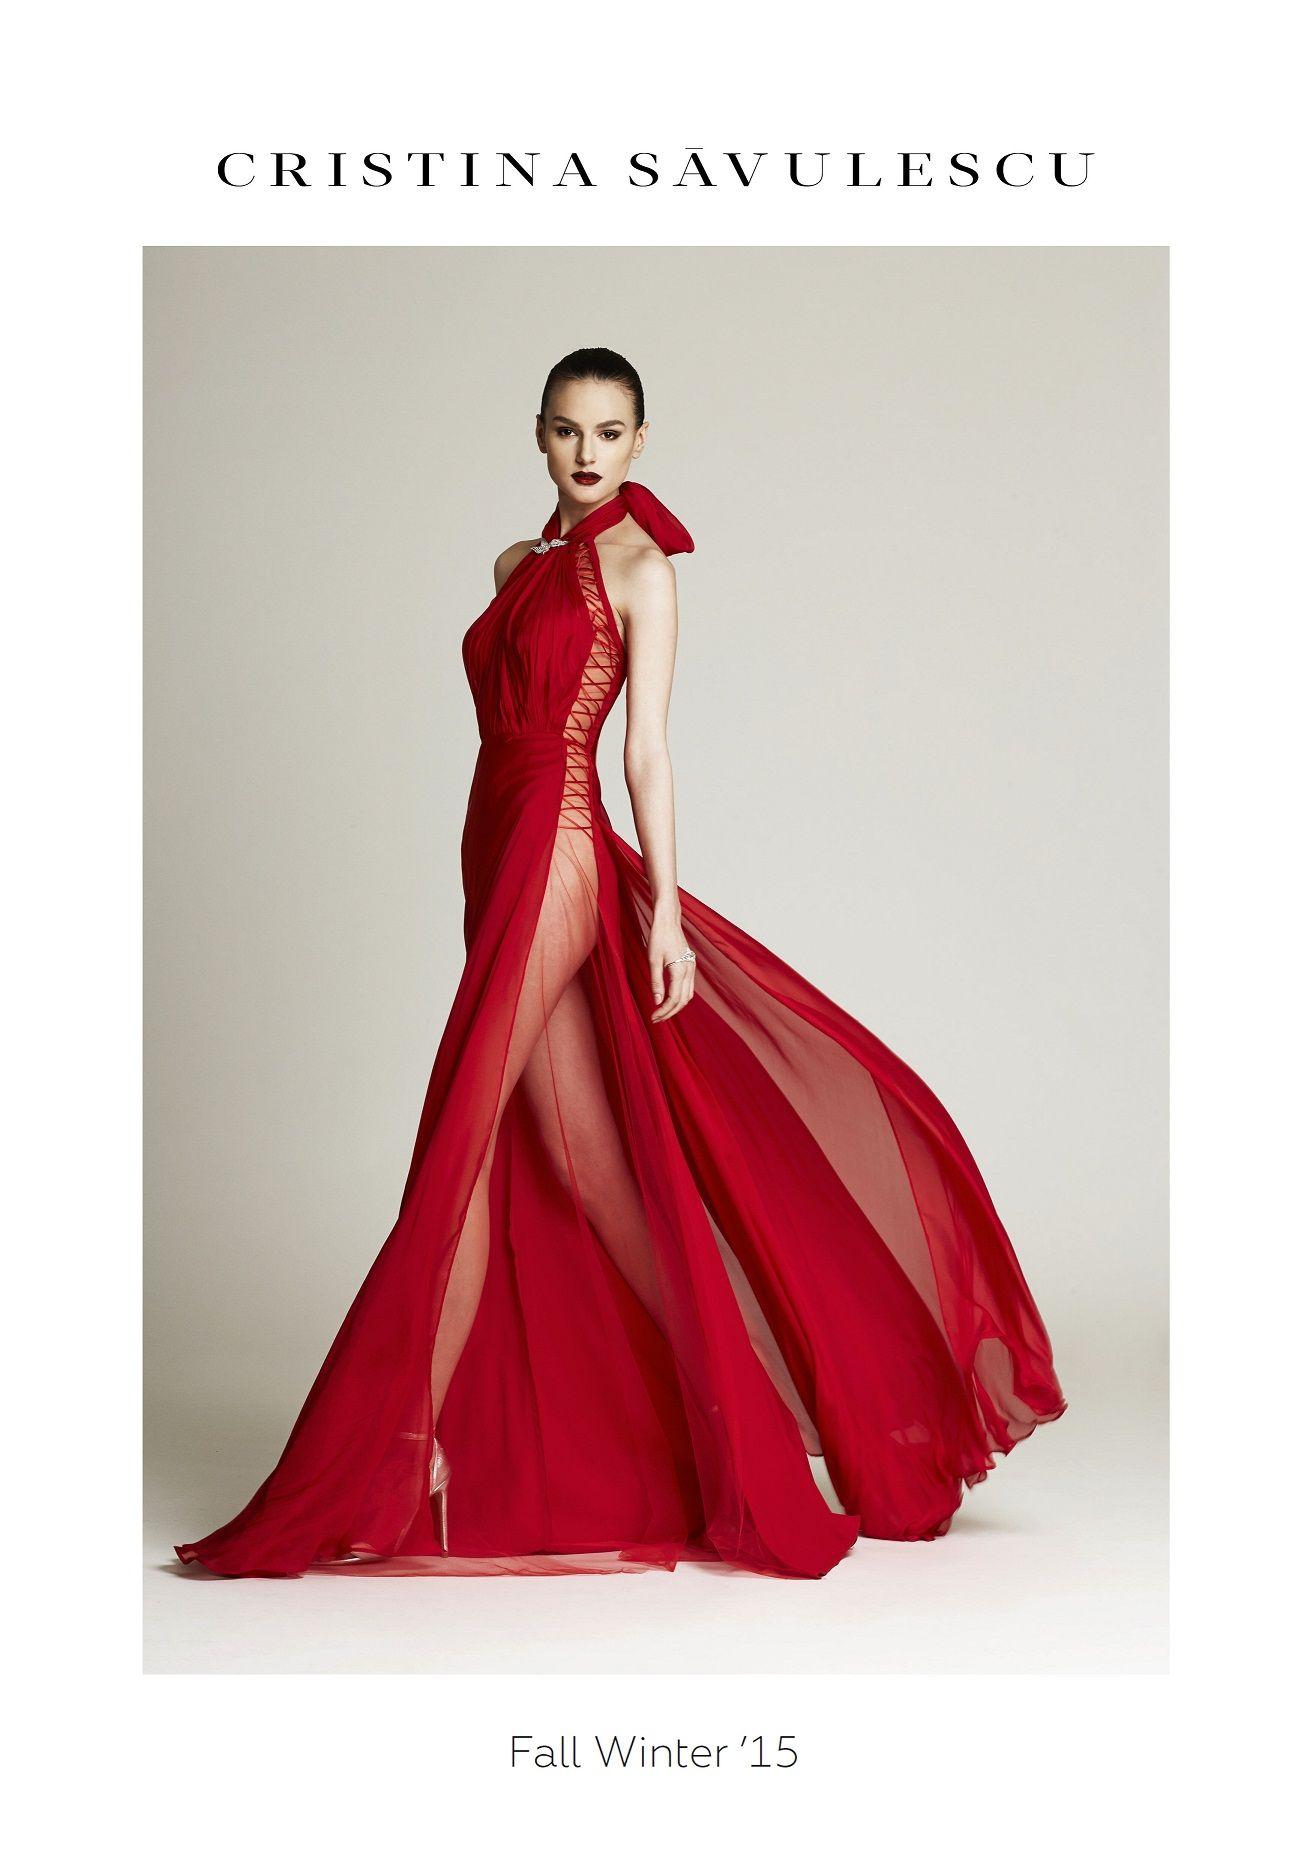 Cristina savulescu fallwinter red dress pinterest fall